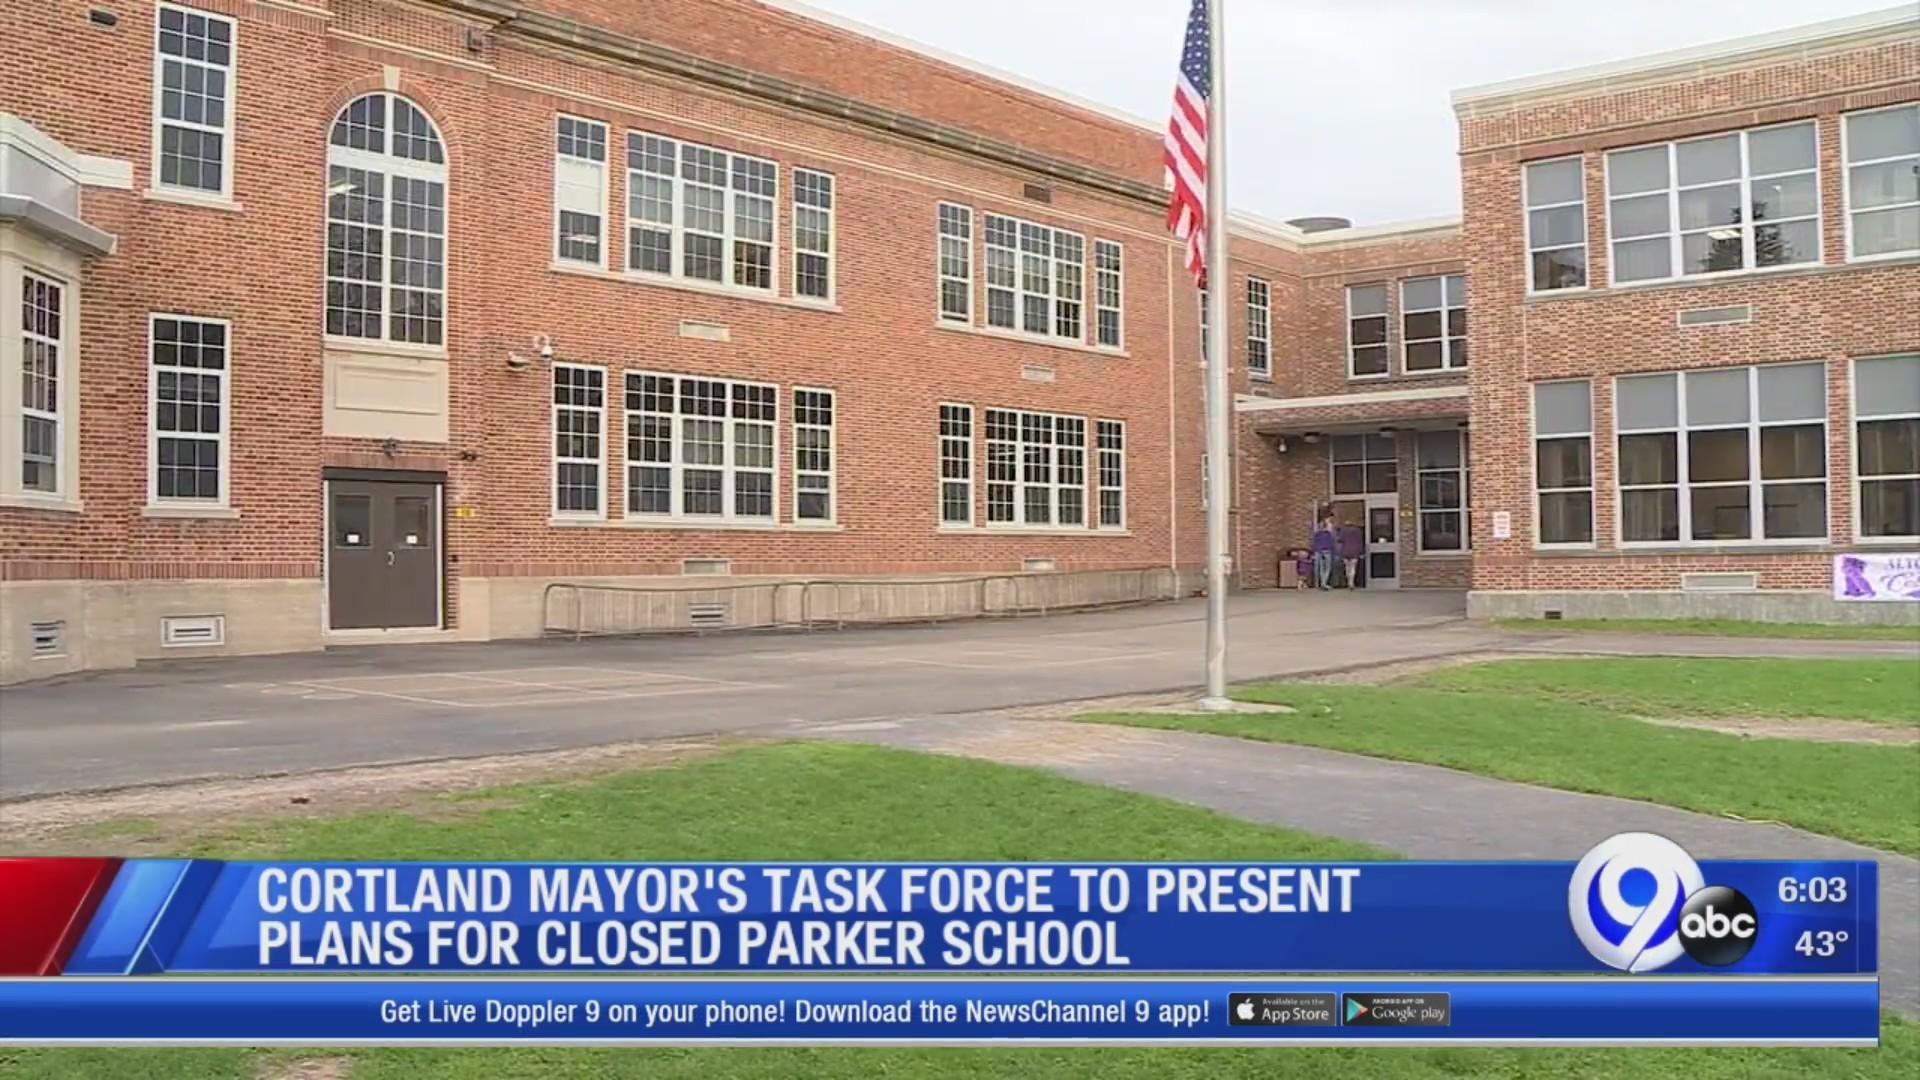 Cortland_mayor_working_to_ensure_Parker__0_20190522125056